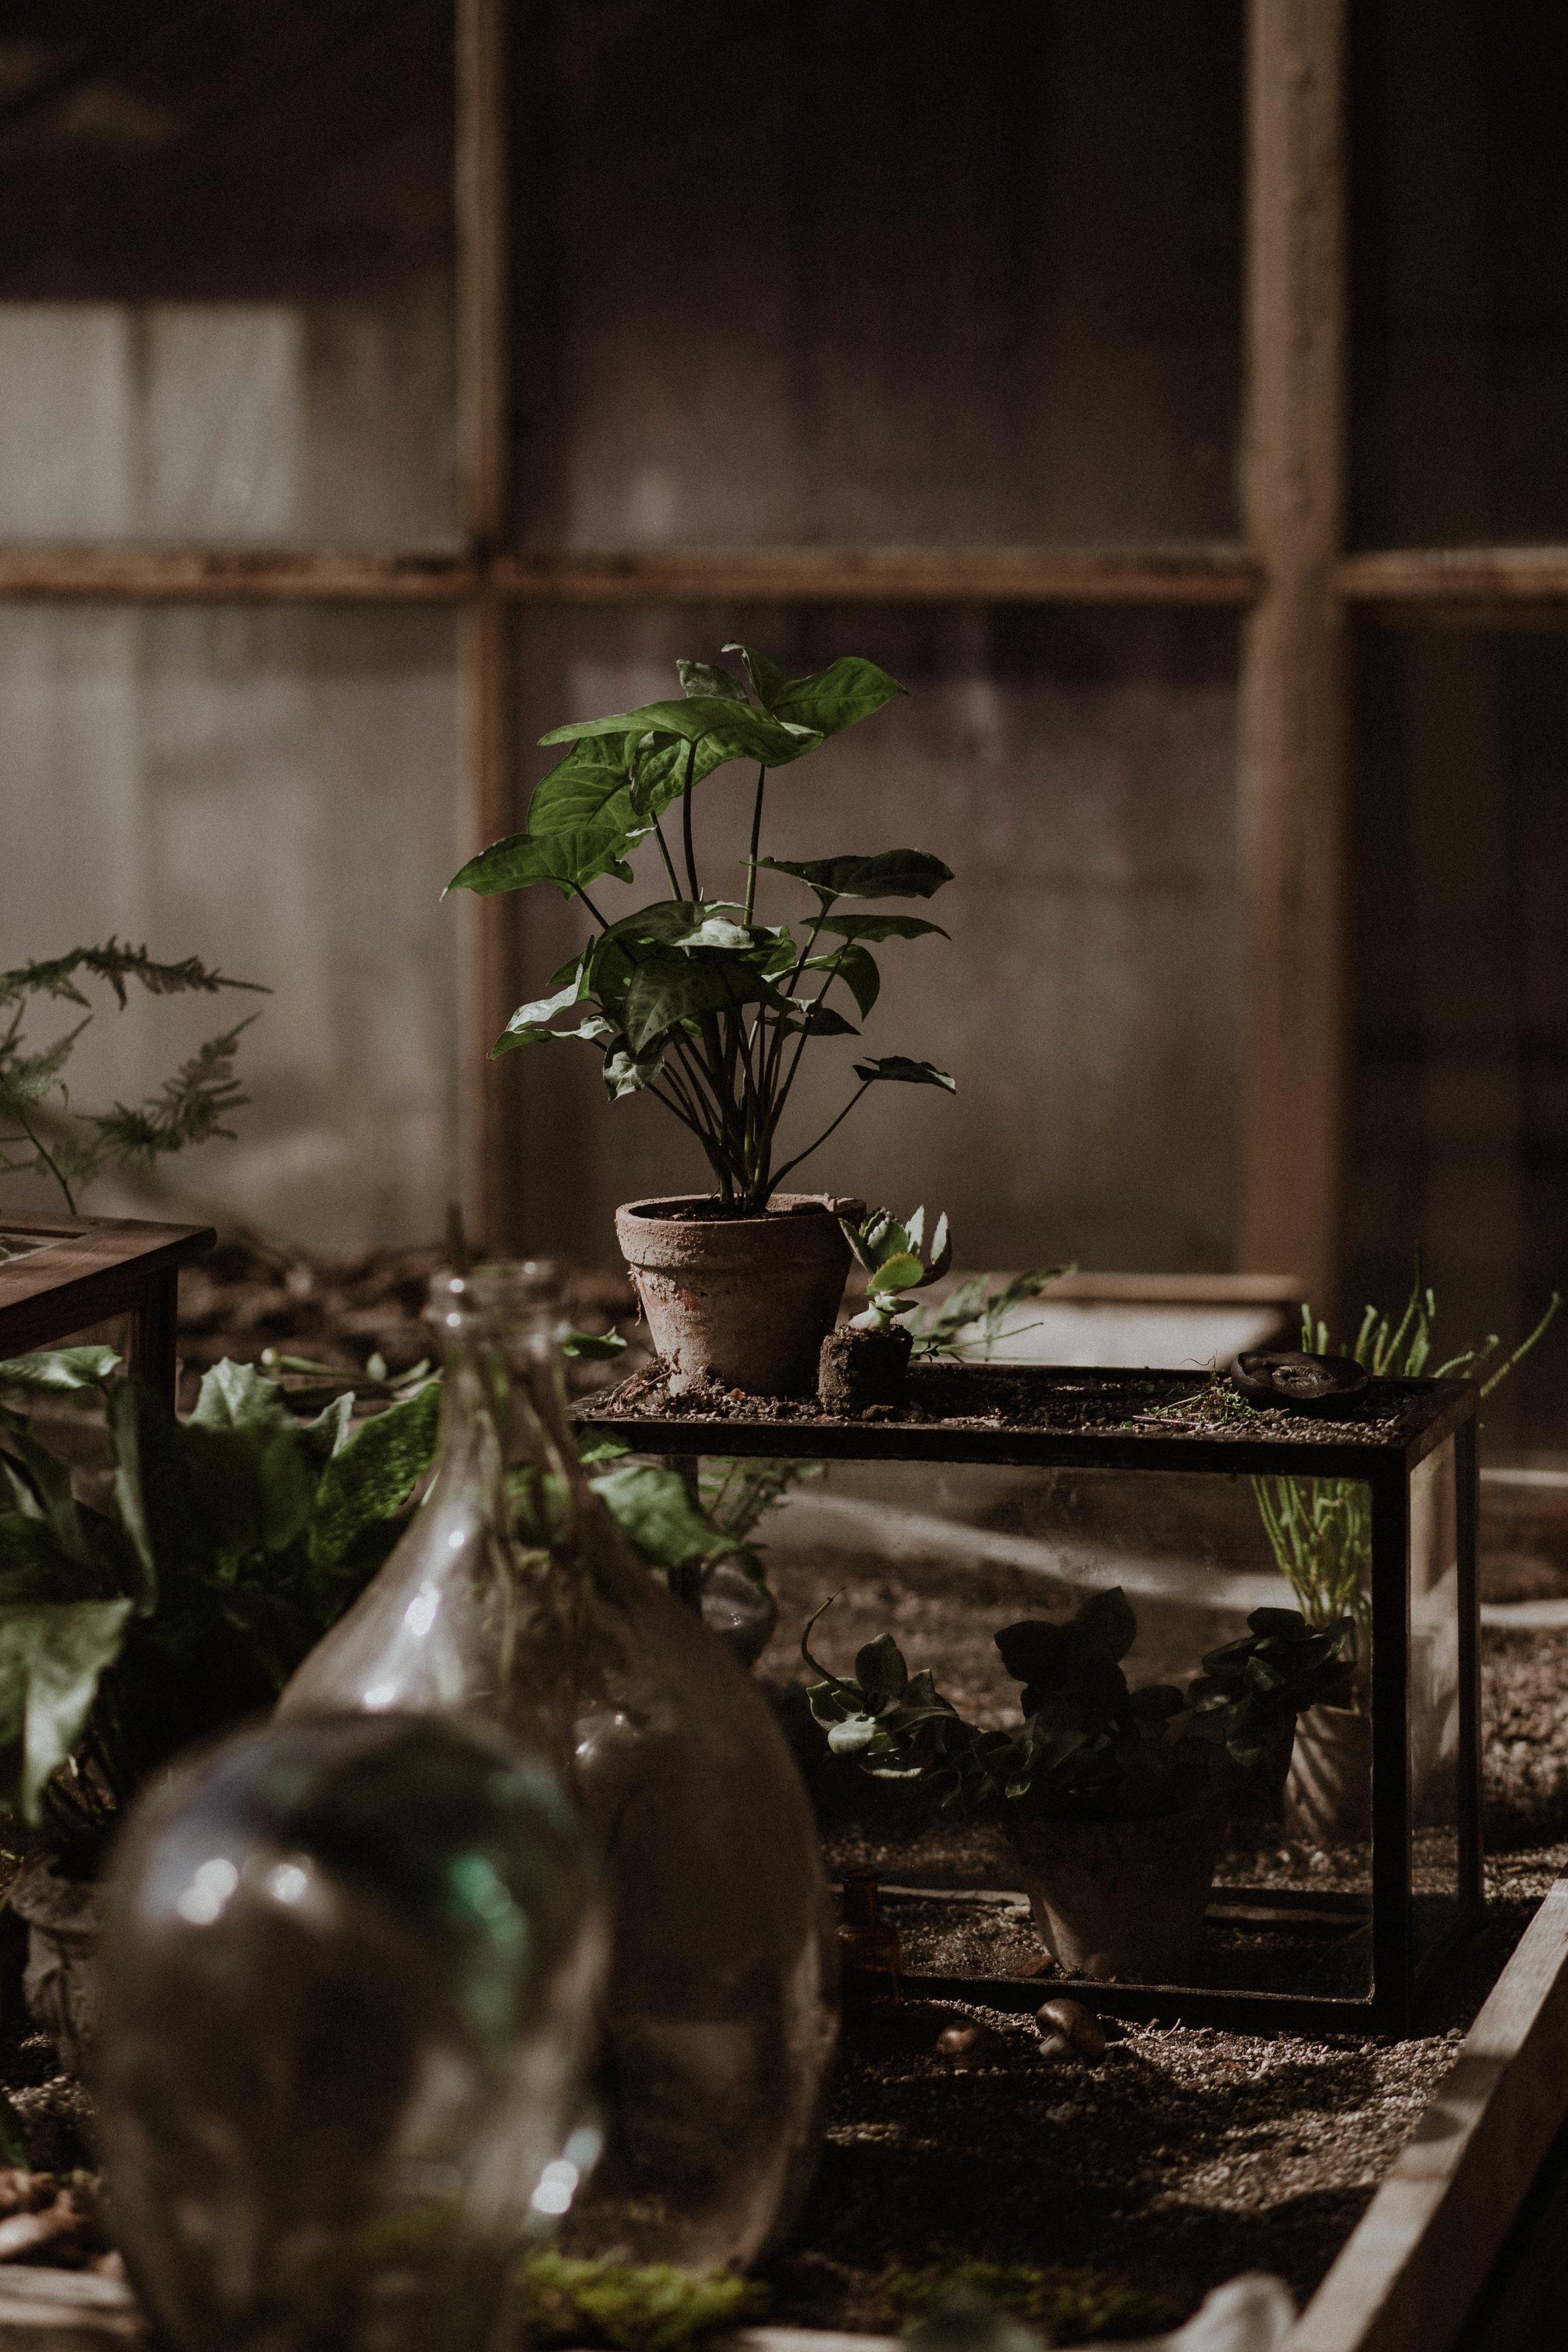 20170321_greenhouse_stsh_w_035__MG_5999.jpg